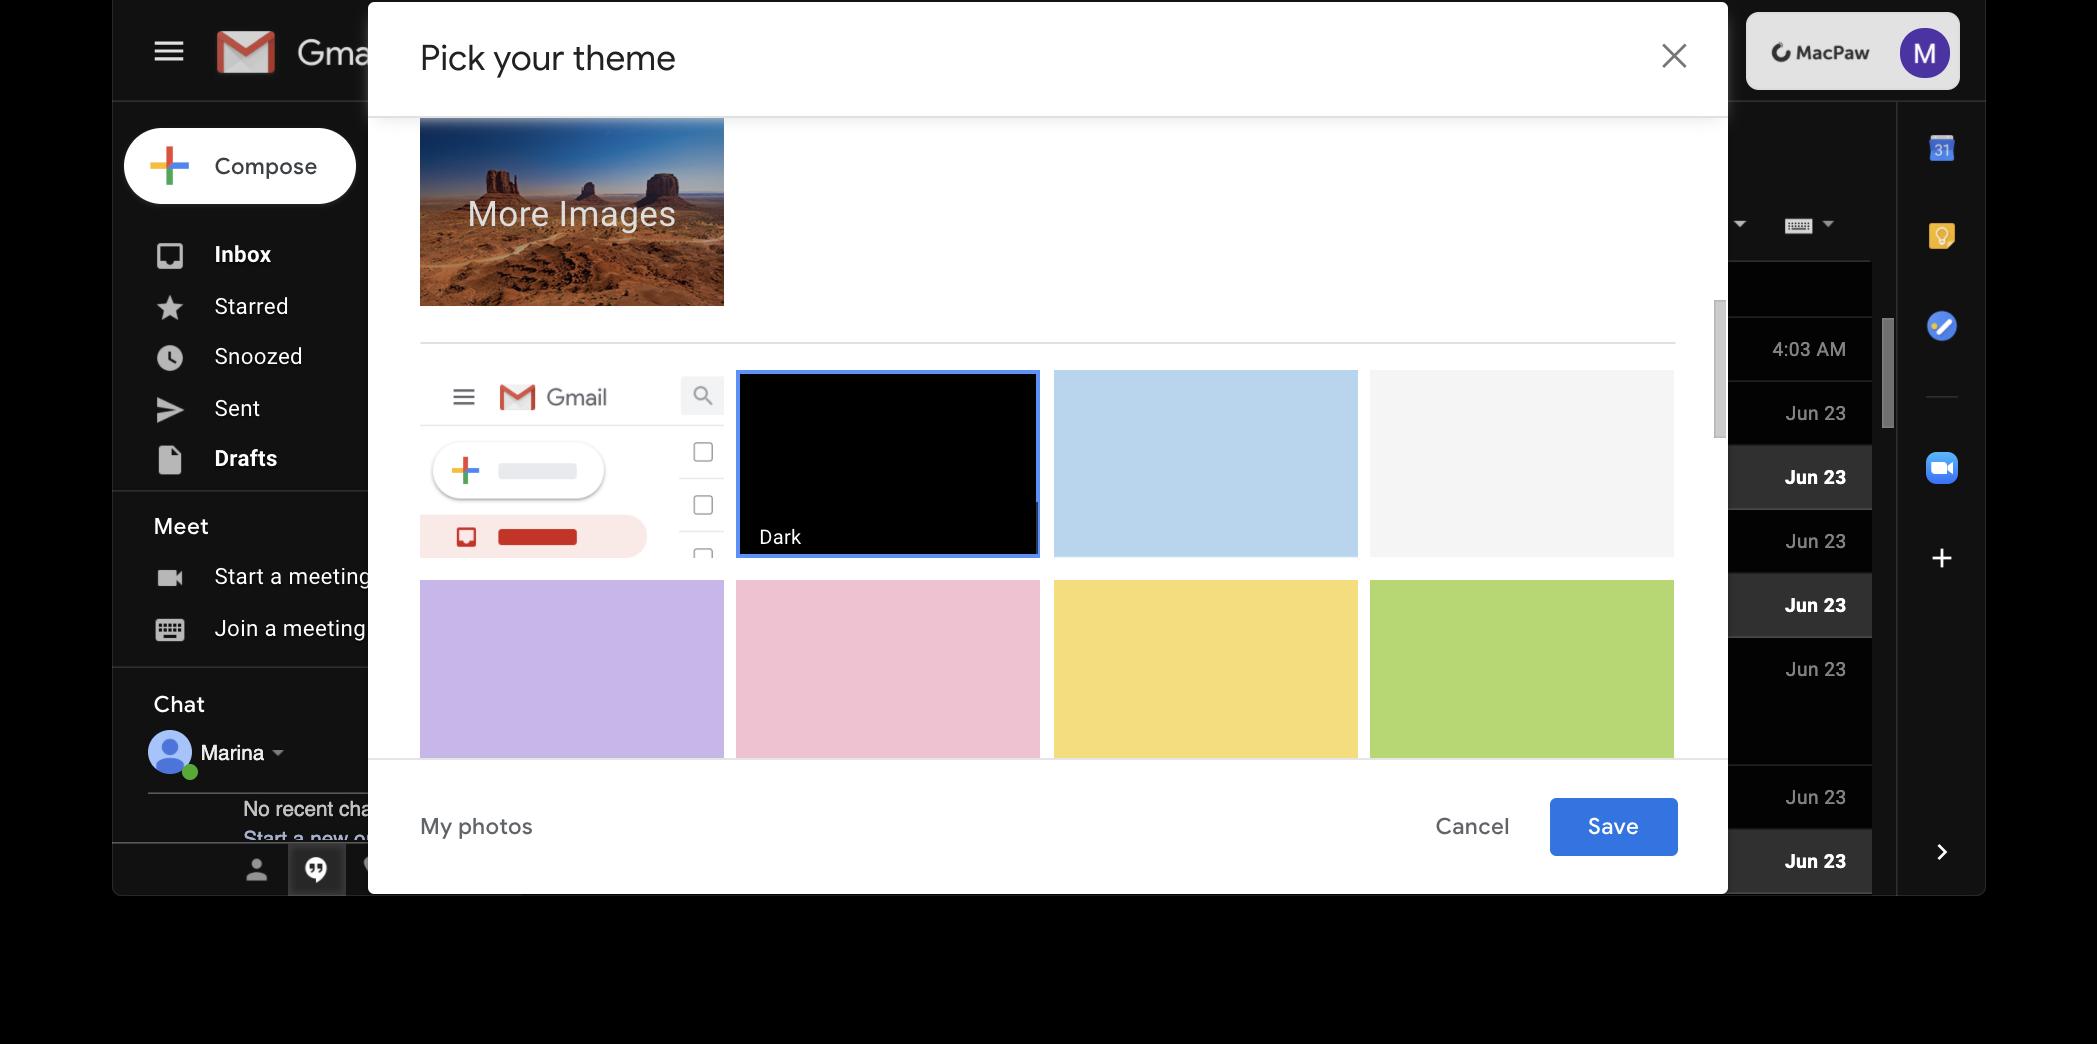 Choose Dark theme